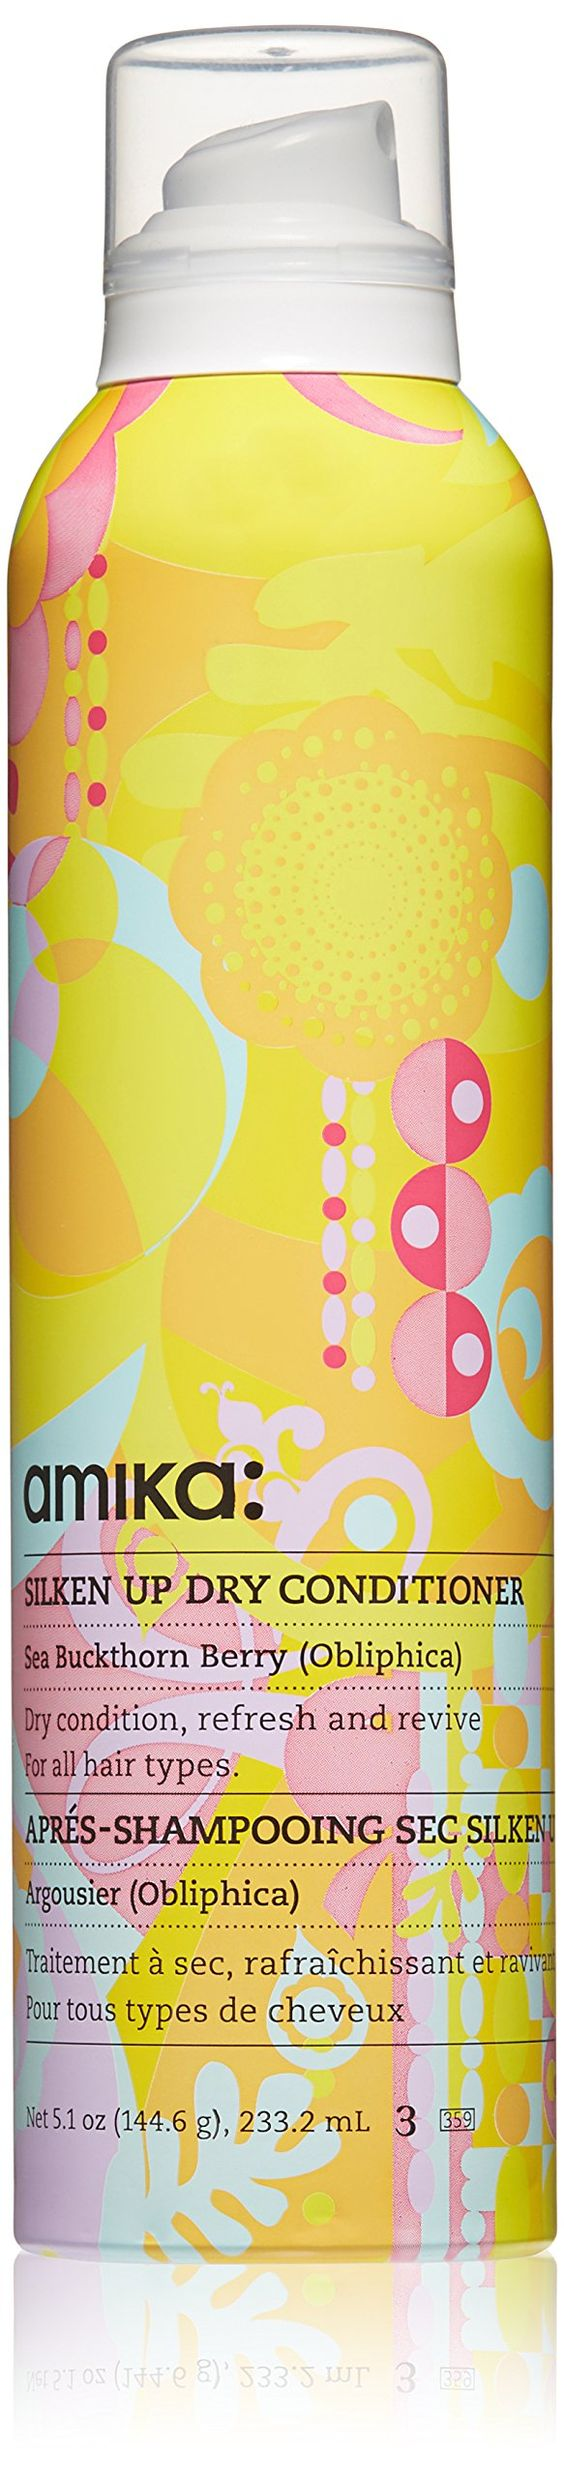 Amika Silken Up Dry Conditioner Dry Conditioner Dry Shampoo Amika